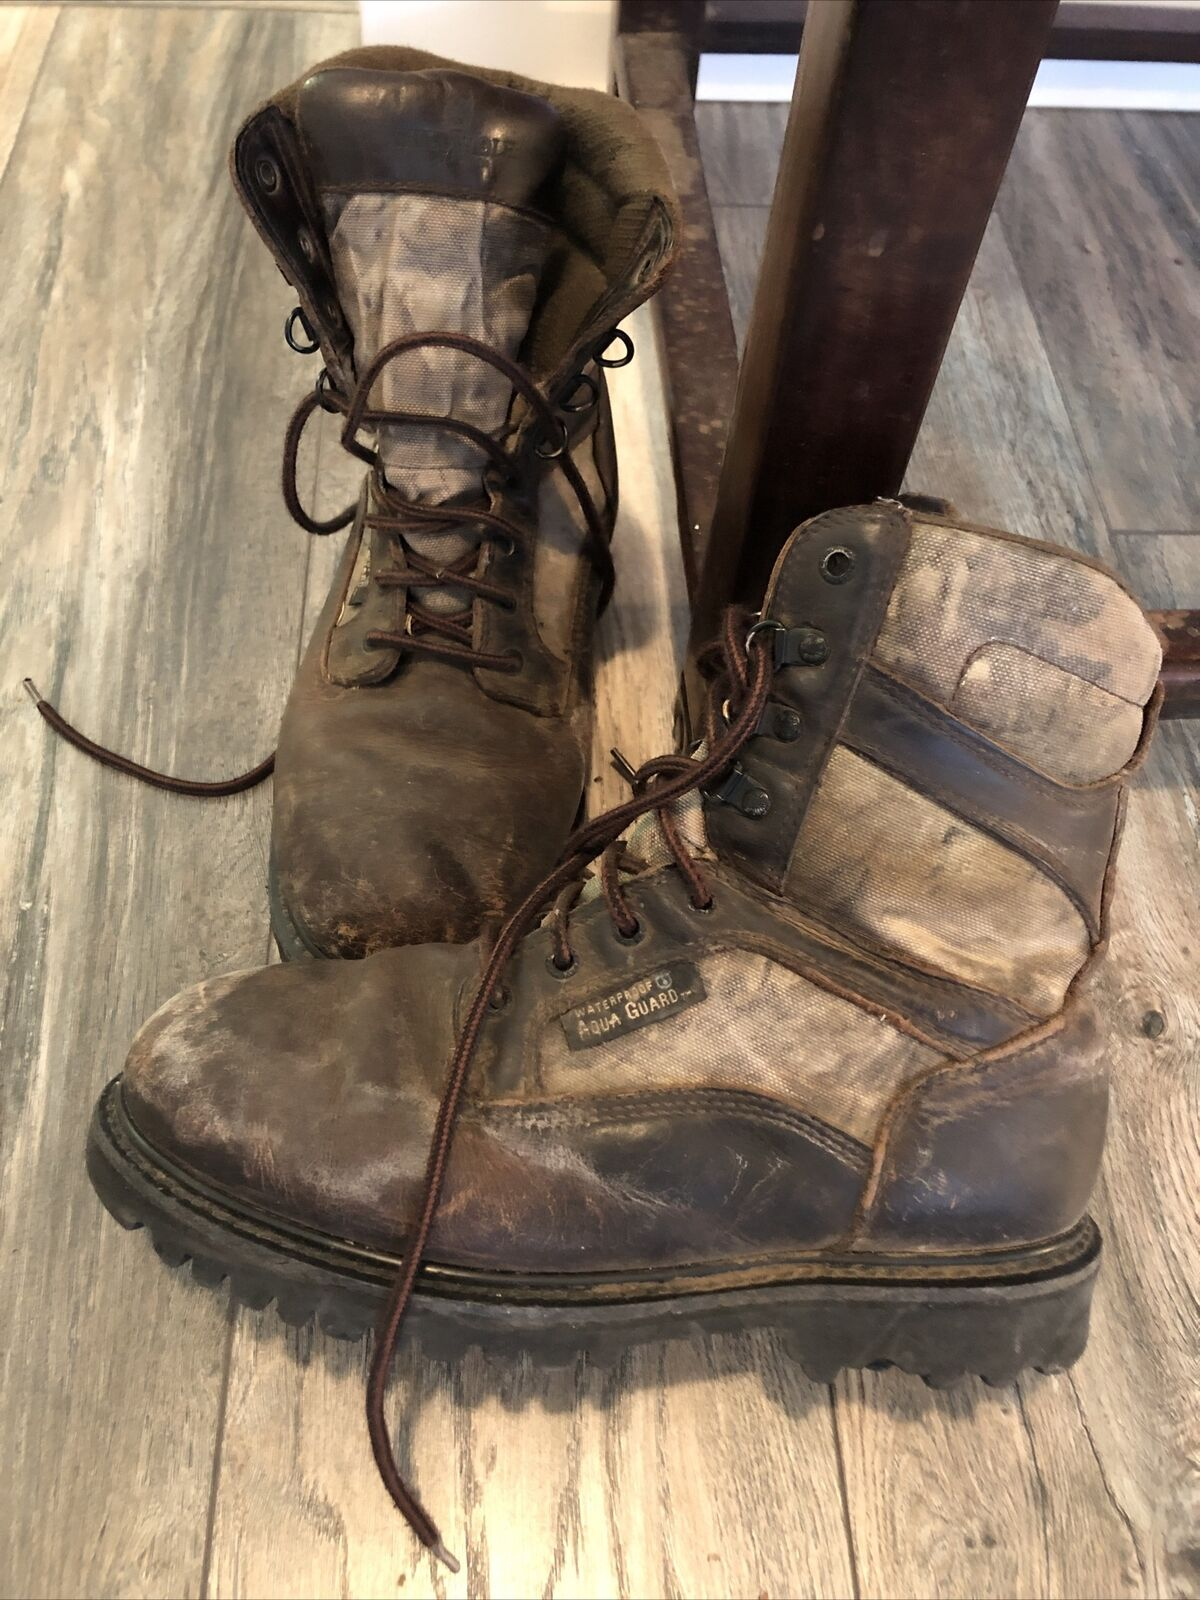 Rocky Wild Wolf Camo Aqua Guard Boots Men 9 W Insulated 800 Grams